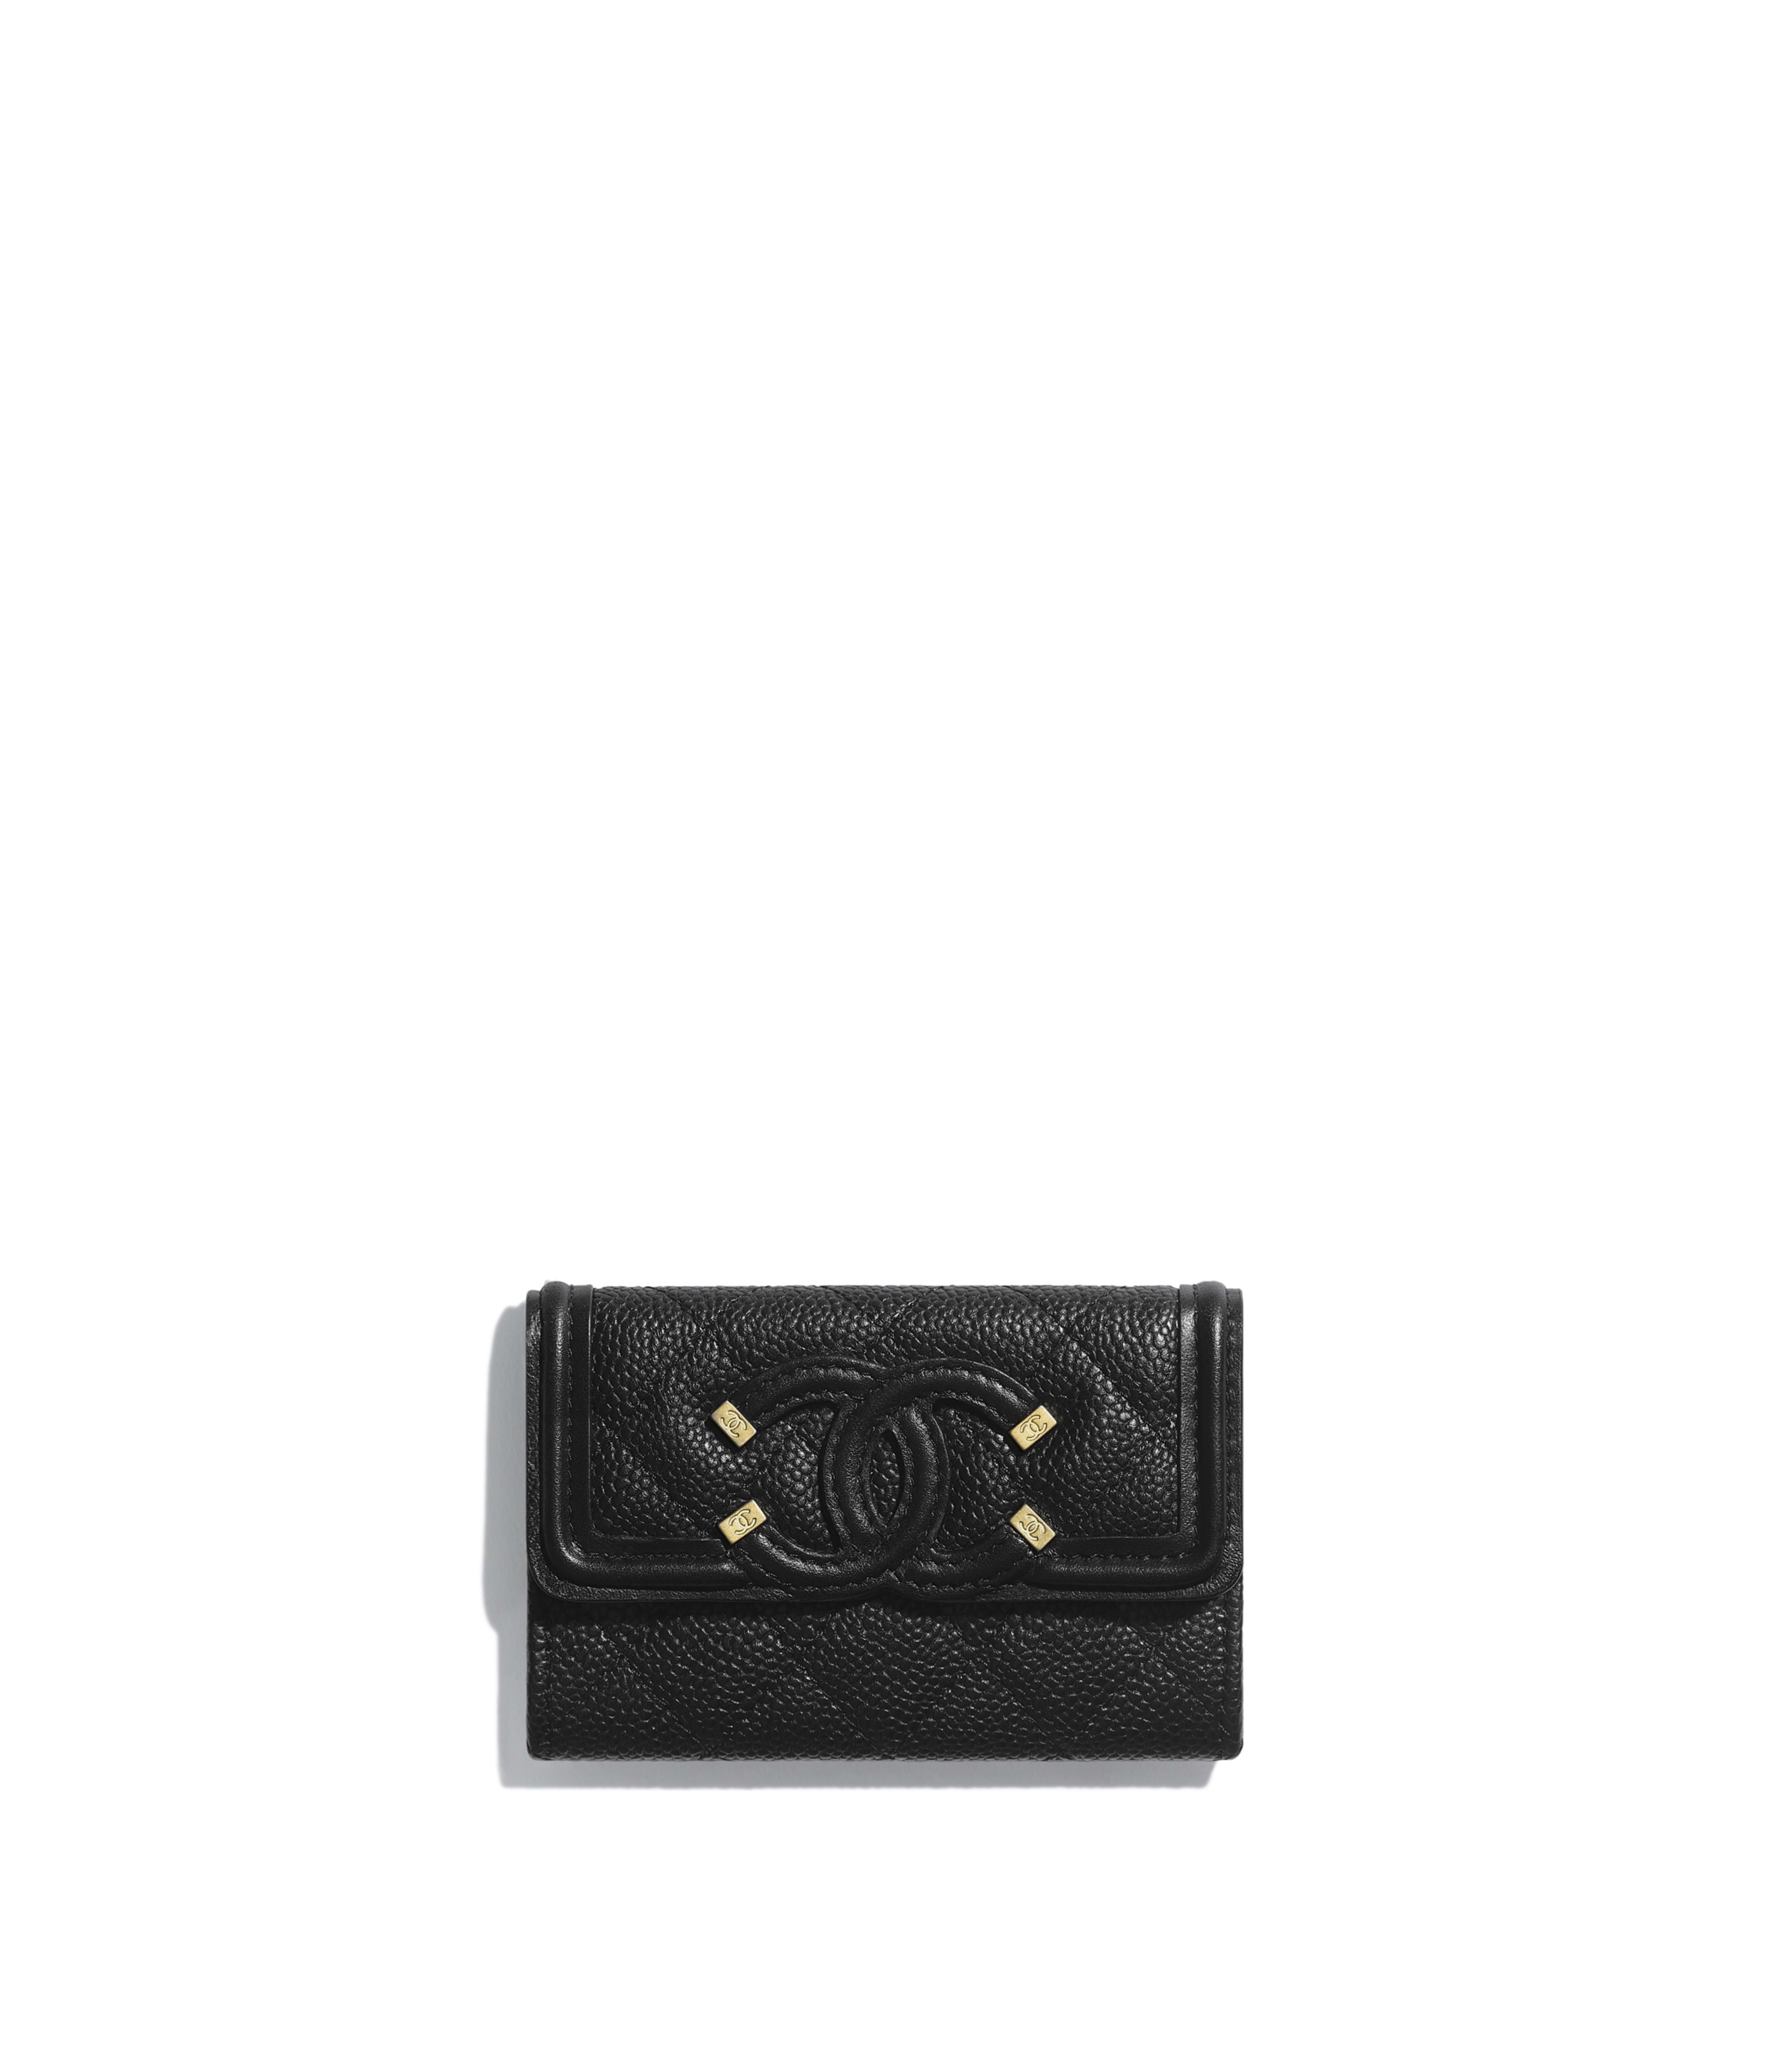 92371ab91da0 Flap Card Holder Grained Calfskin, Smooth Calfskin & Gold-Tone Metal, Black  Ref. AP0305Y6054294305